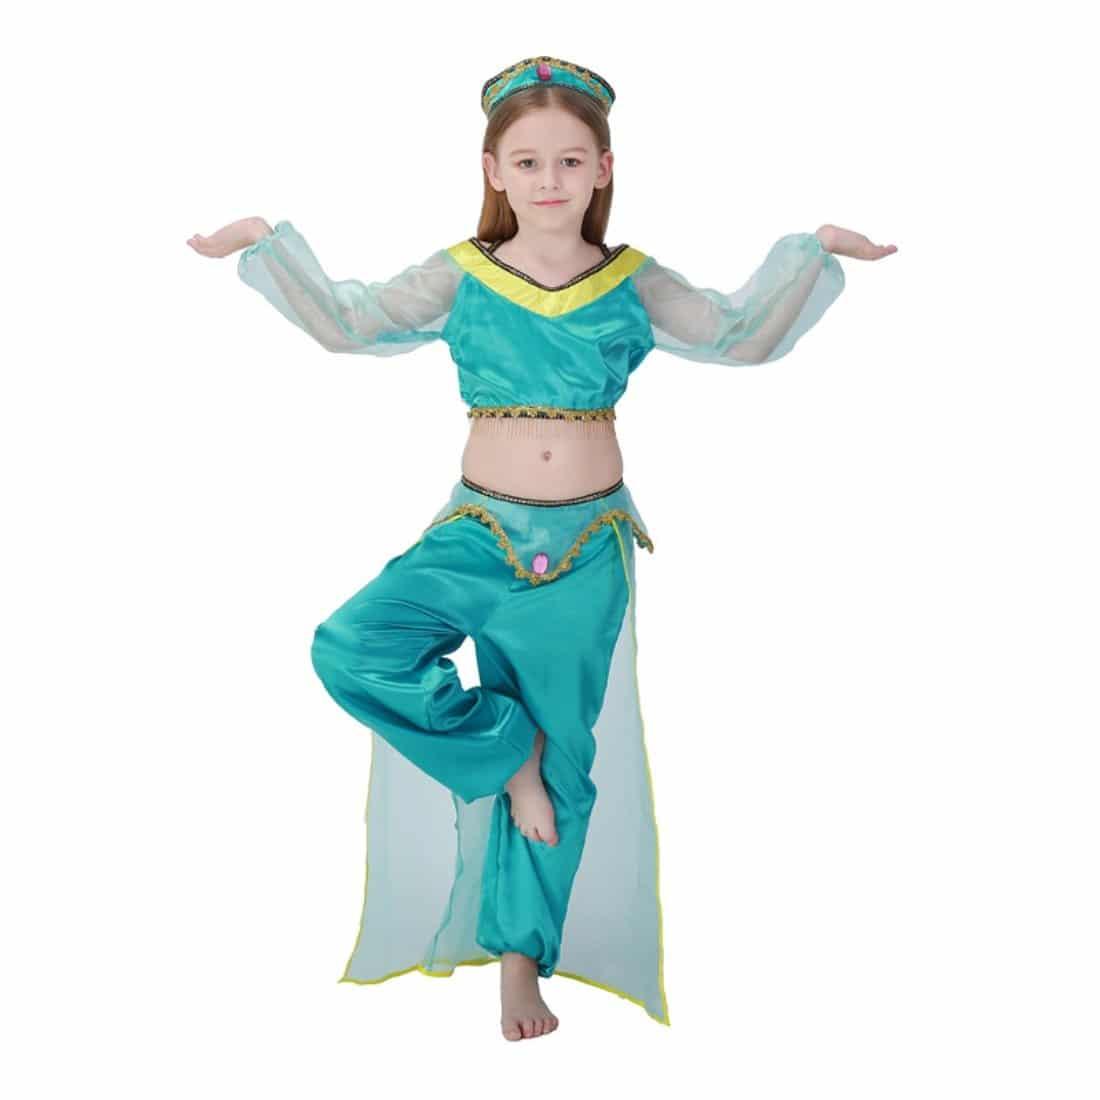 Disfraz de Princesa Árabe Danza Vientre Infantil Niñas